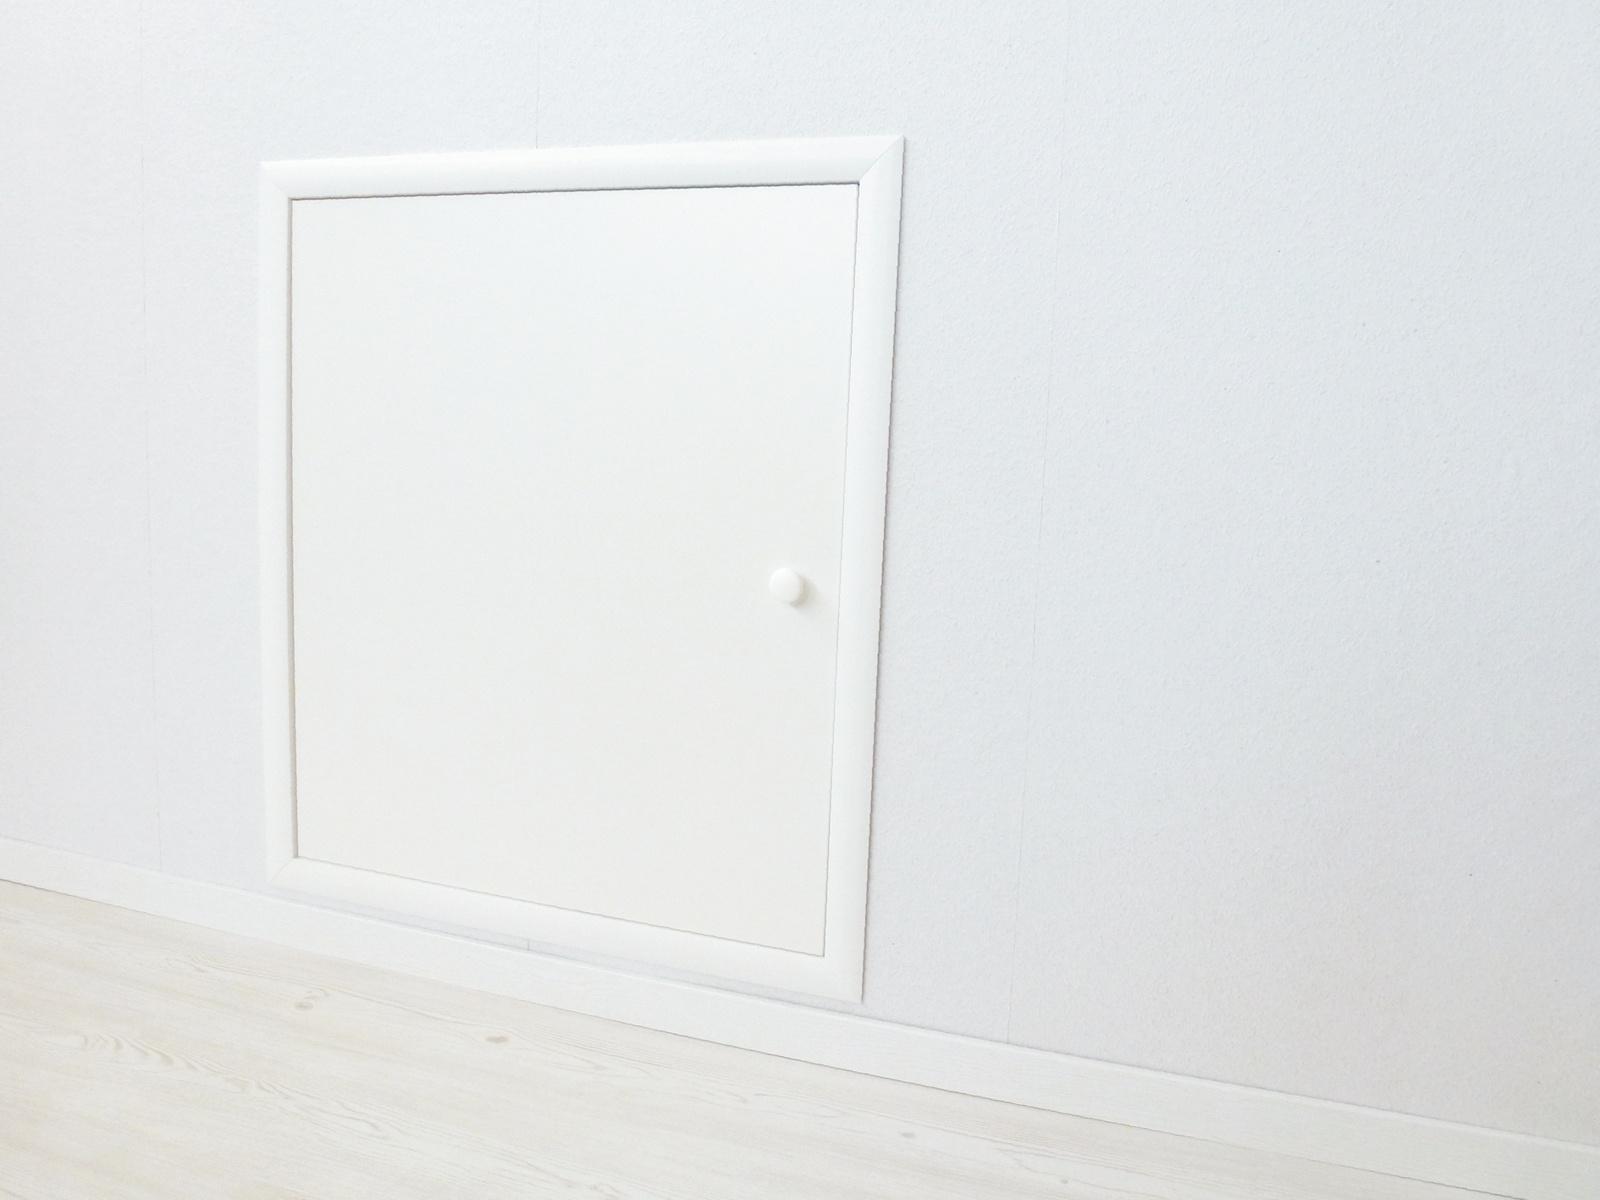 Wellhöfer Kniestocktür (Standardmaße)